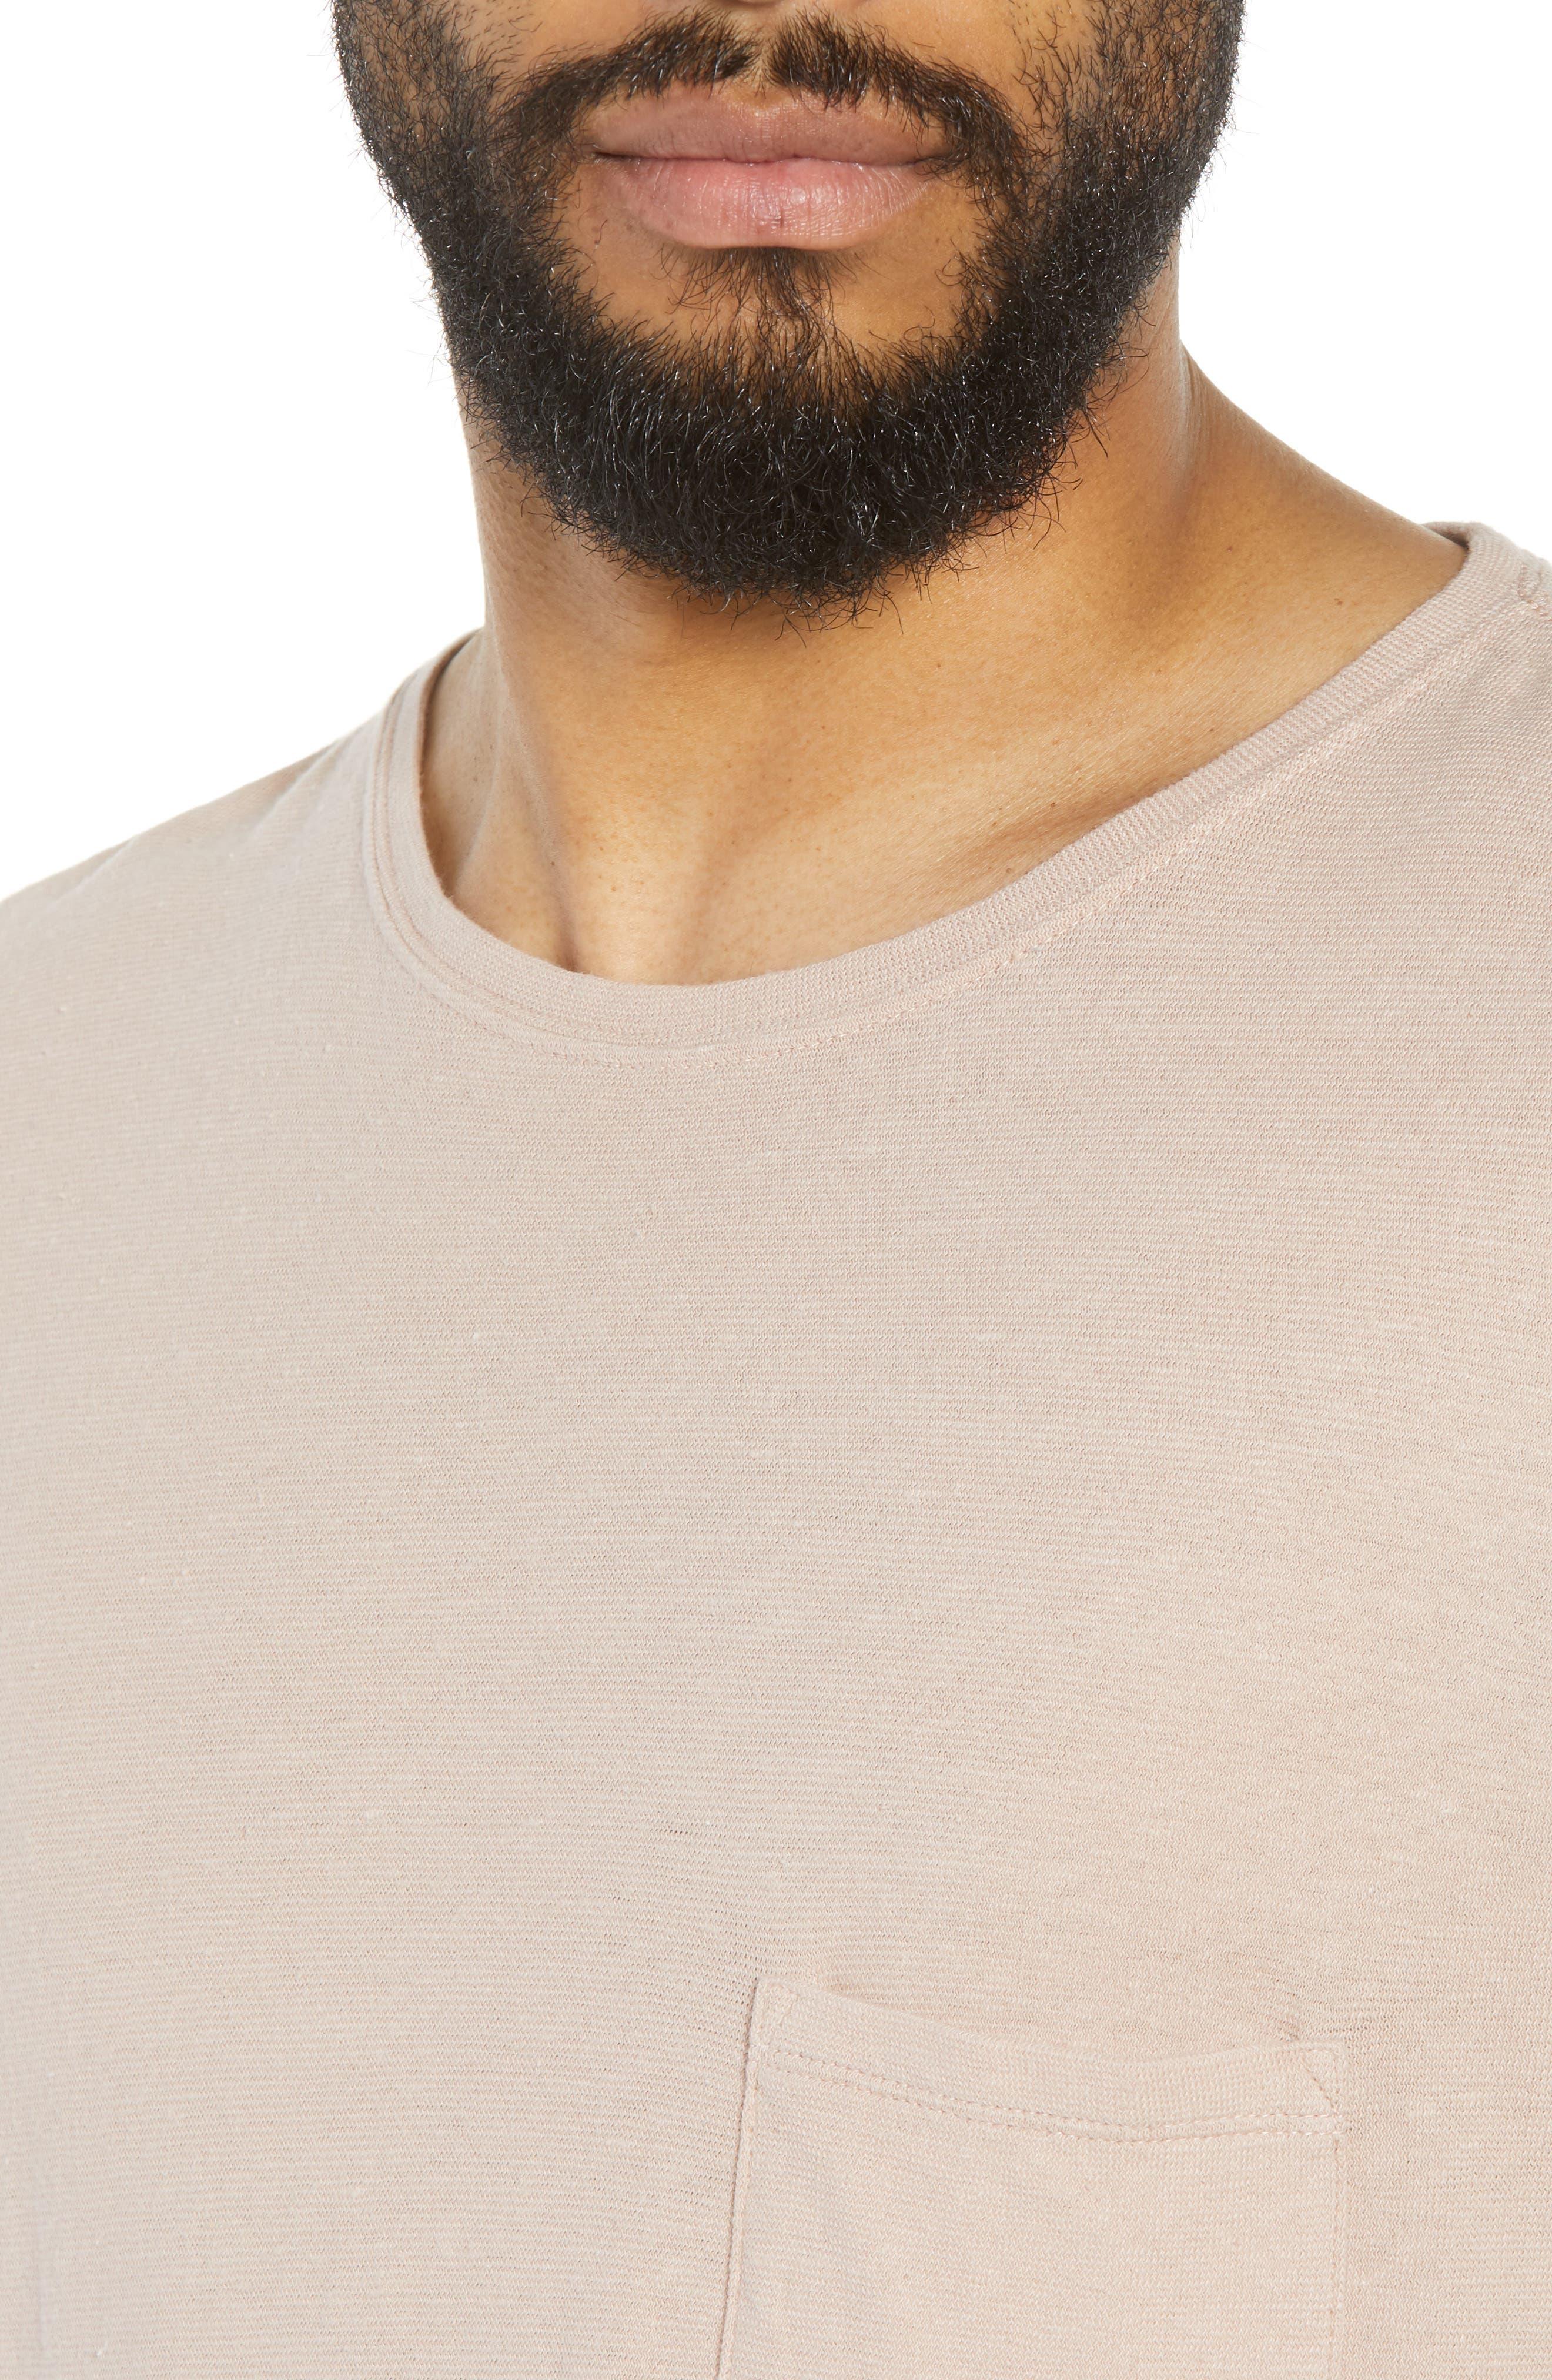 Collett Gauze T-Shirt,                             Alternate thumbnail 4, color,                             250